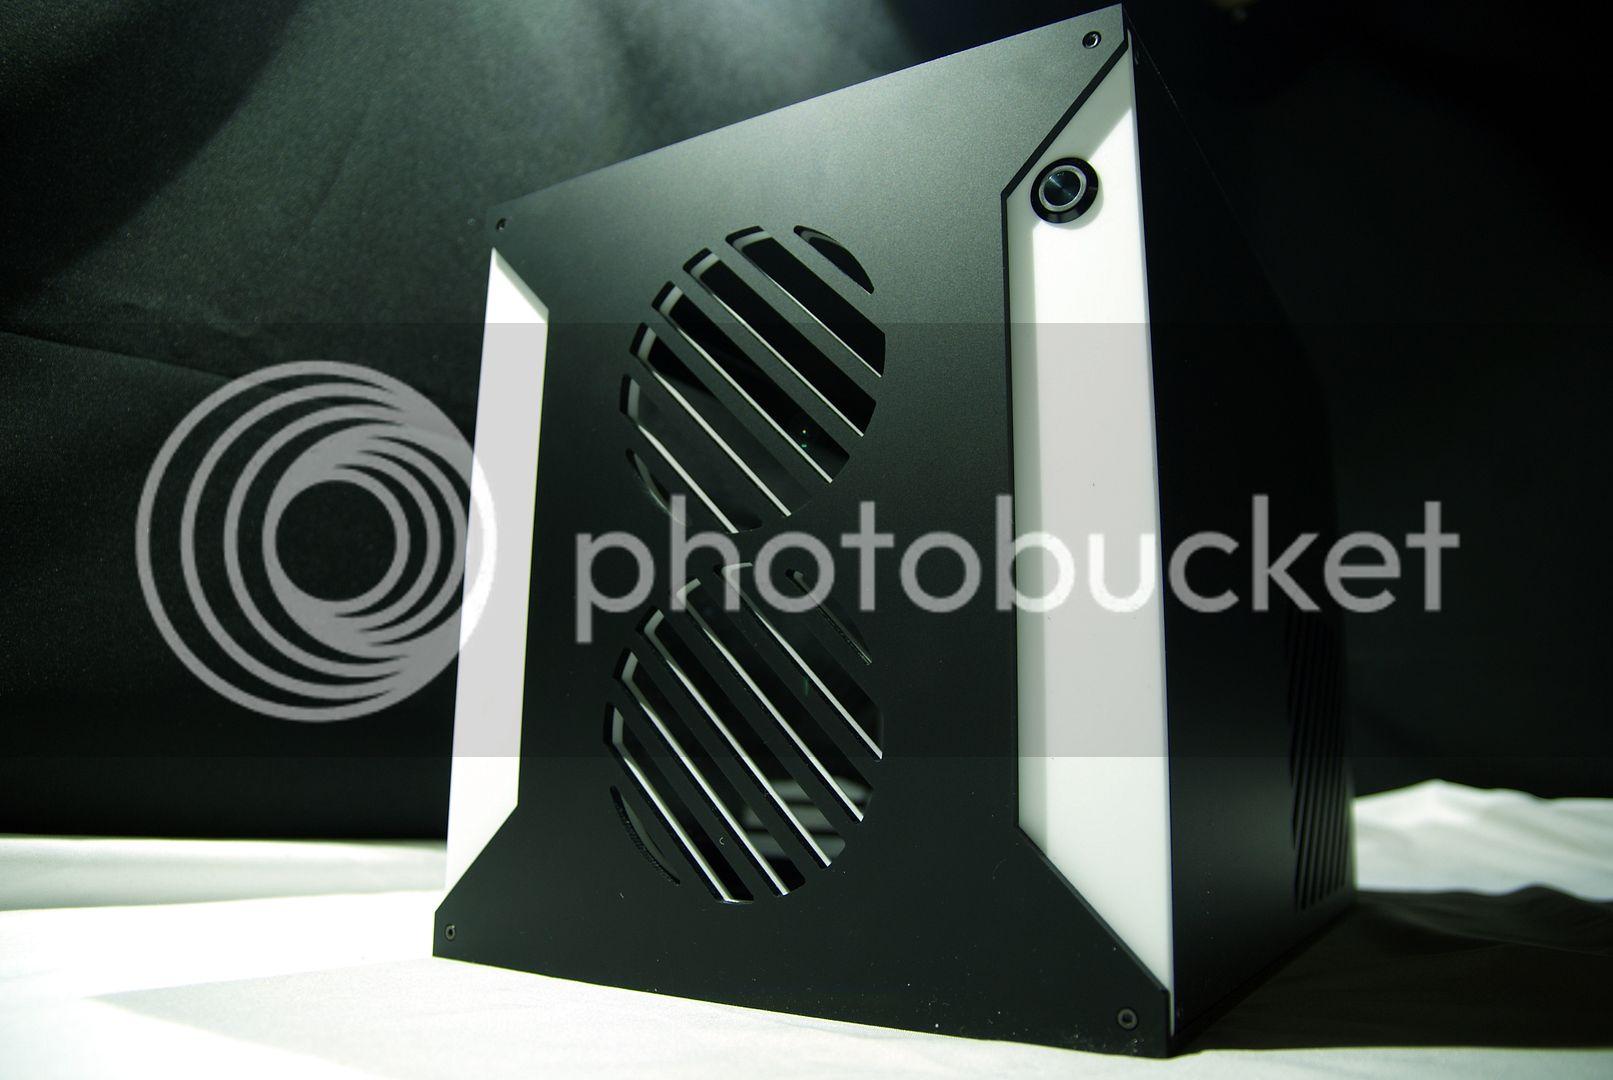 http://i759.photobucket.com/albums/xx233/kier1976/NEW/Parvum/P2/DSC00092.jpg